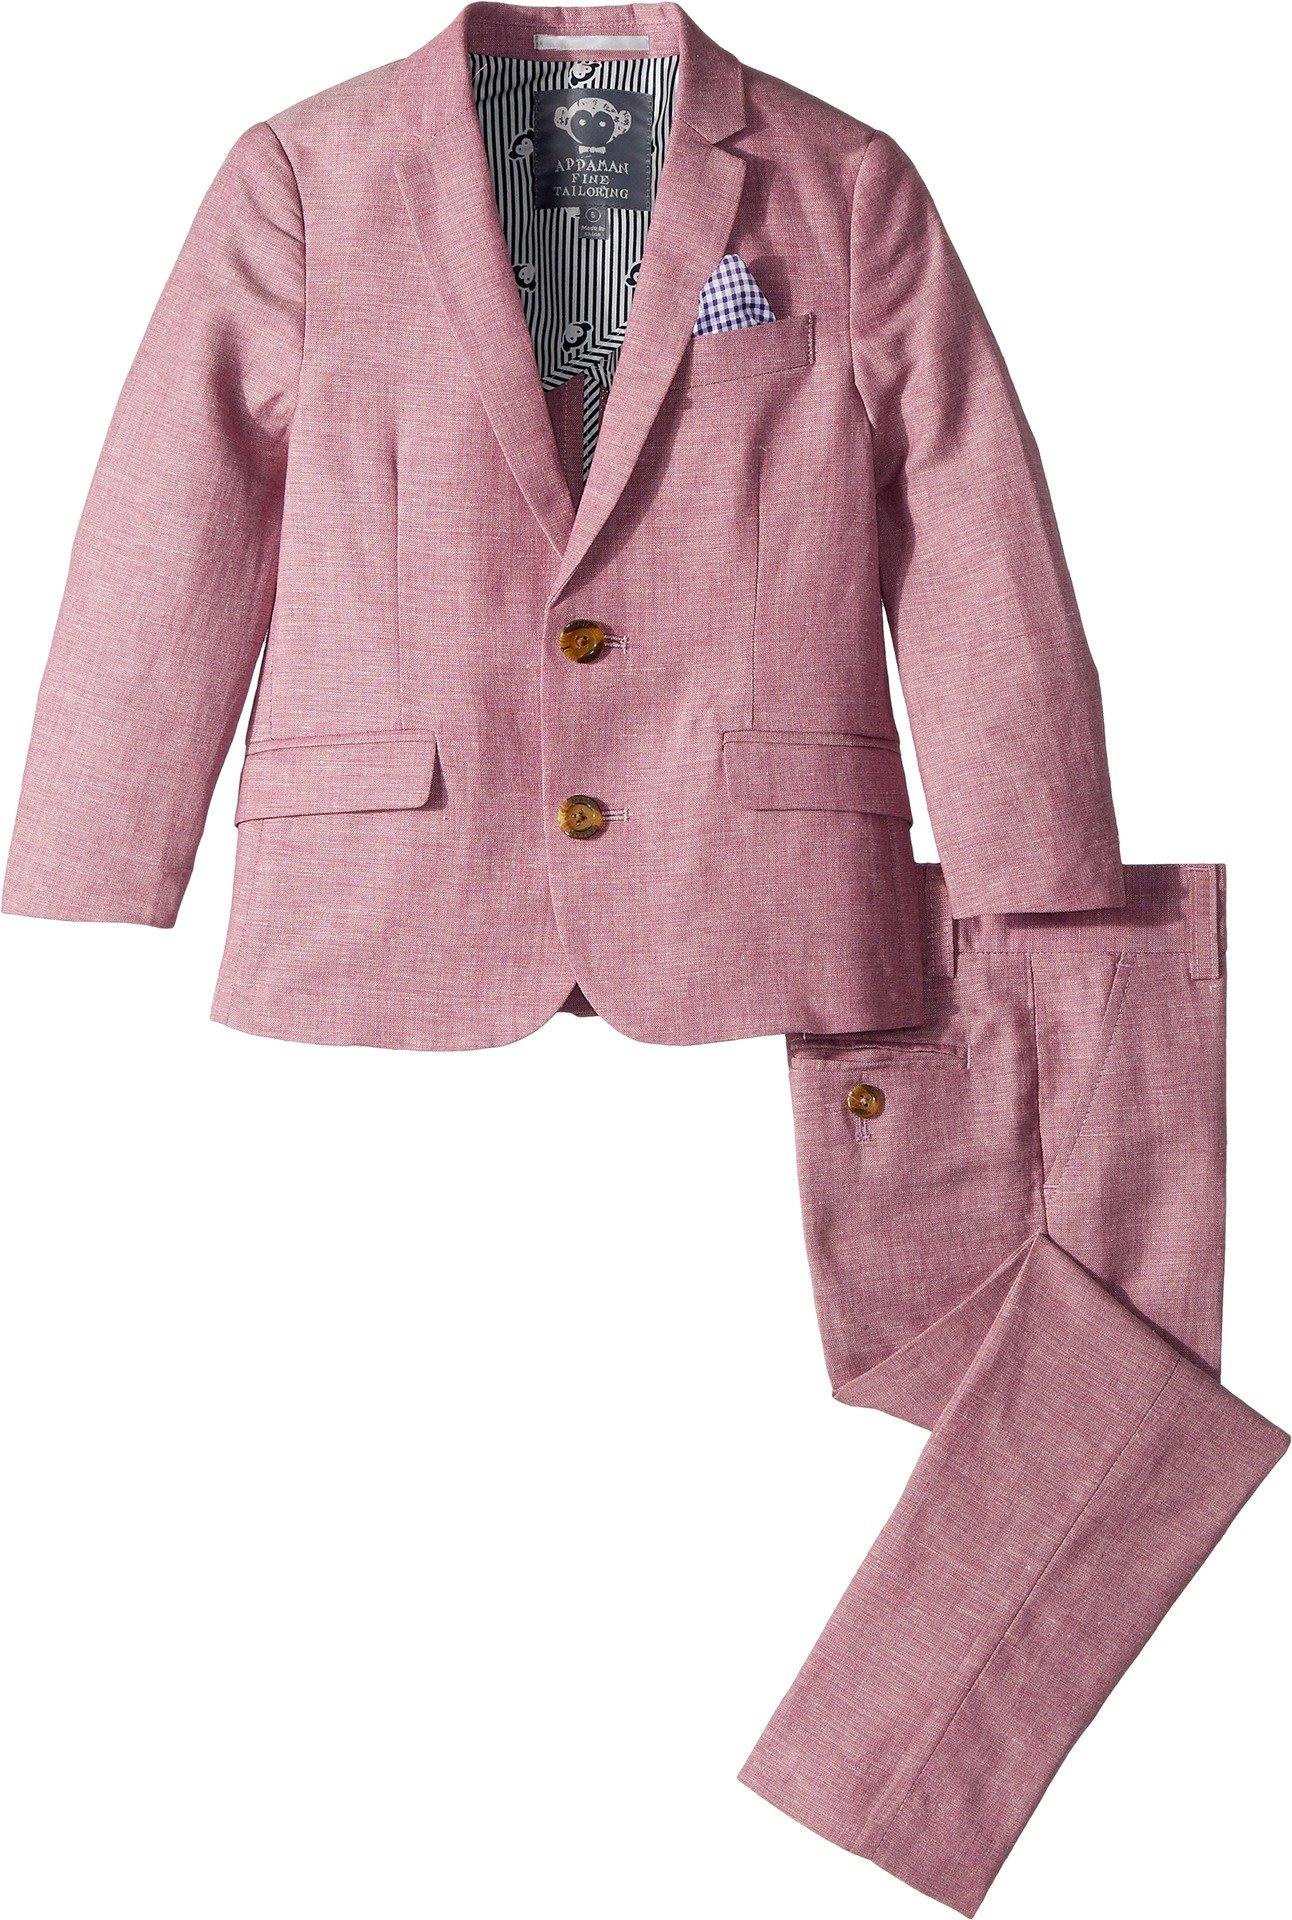 Appaman Kids Baby Boy's Two-Piece MOD Suit (Toddler/Little Kids/Big Kids) Raspberry 6 by Appaman Kids (Image #1)